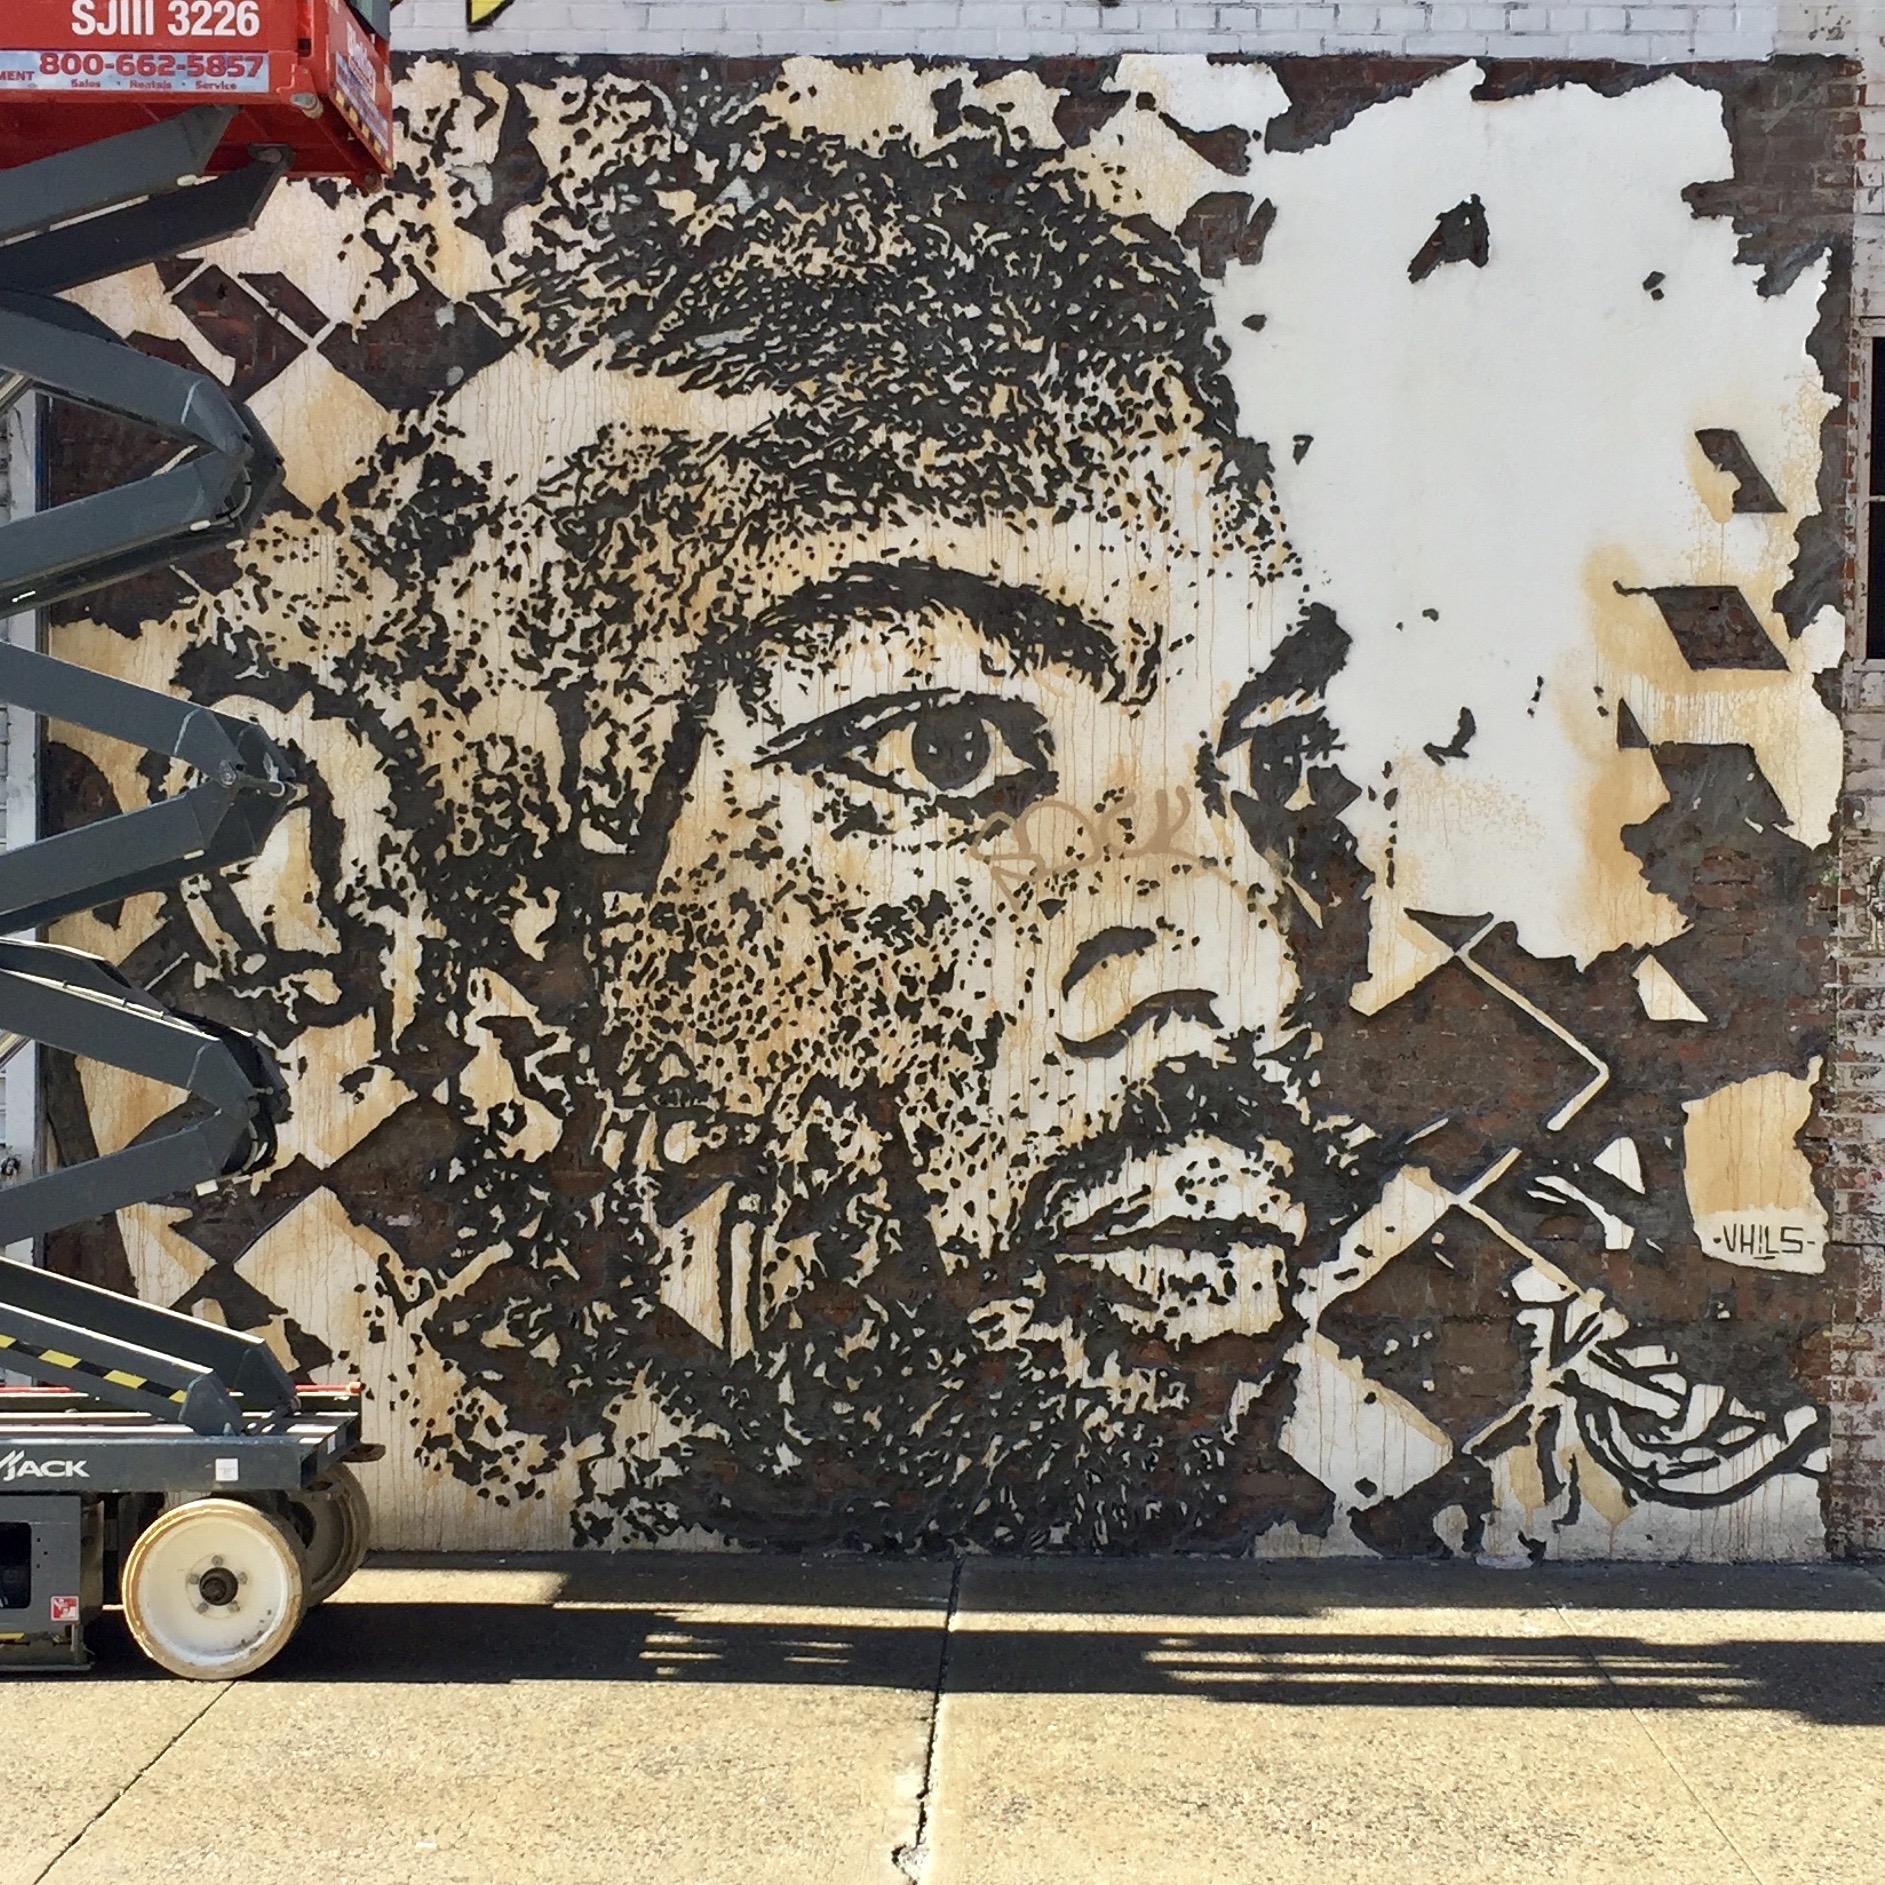 Portrait par Vhils - Liitle Italy - Lisa Project - Street Art New York